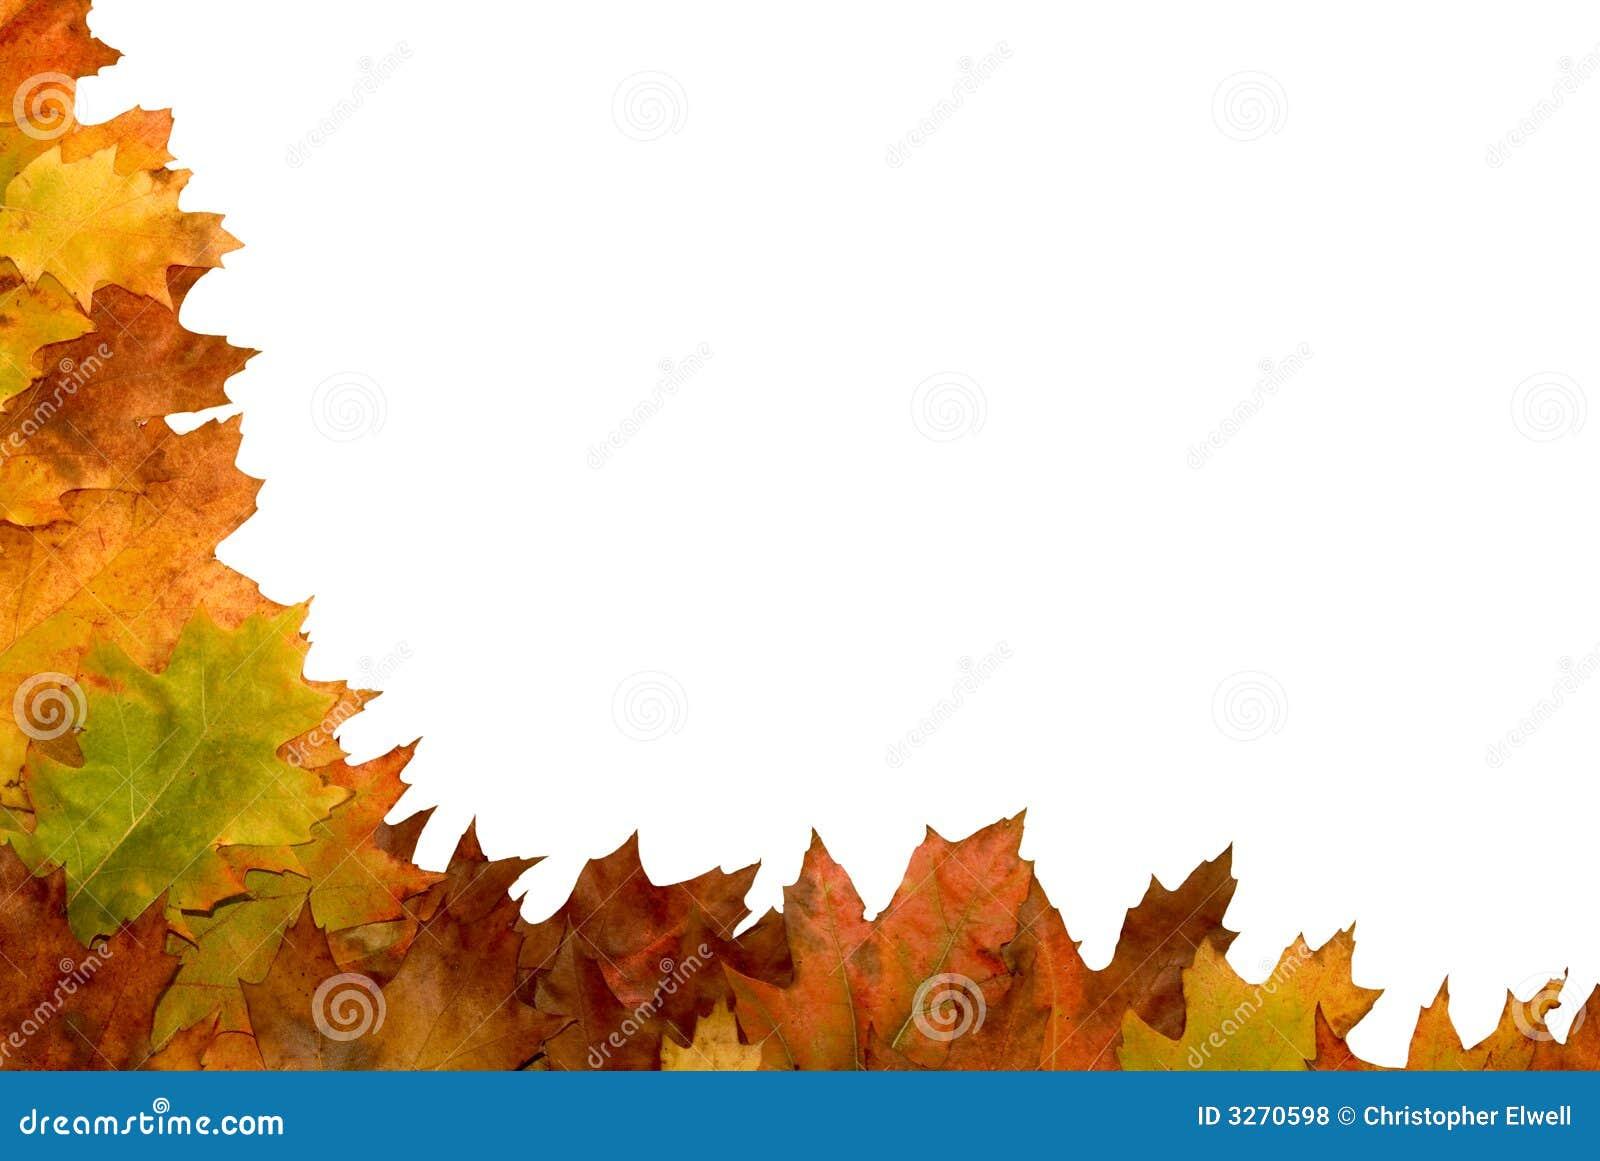 Autumn leaf border stock photo. Image of mount, autumn ...